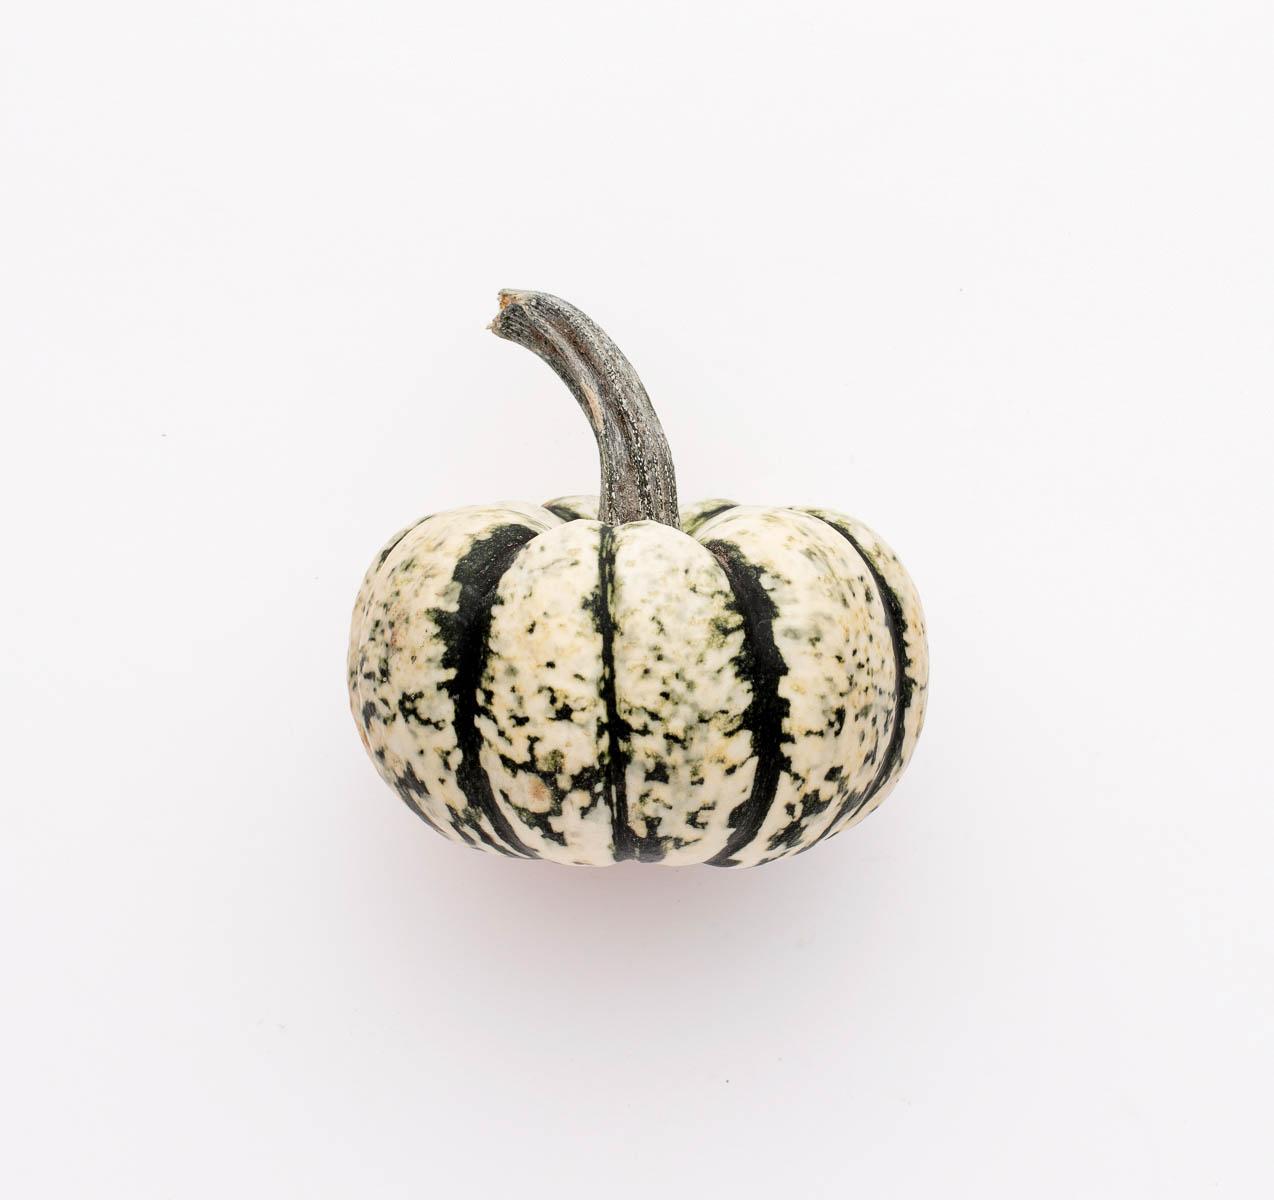 pyo-pumpkin-kent-pick-your-own-pumpkin-green-and-white-support-local-magazine.JPG